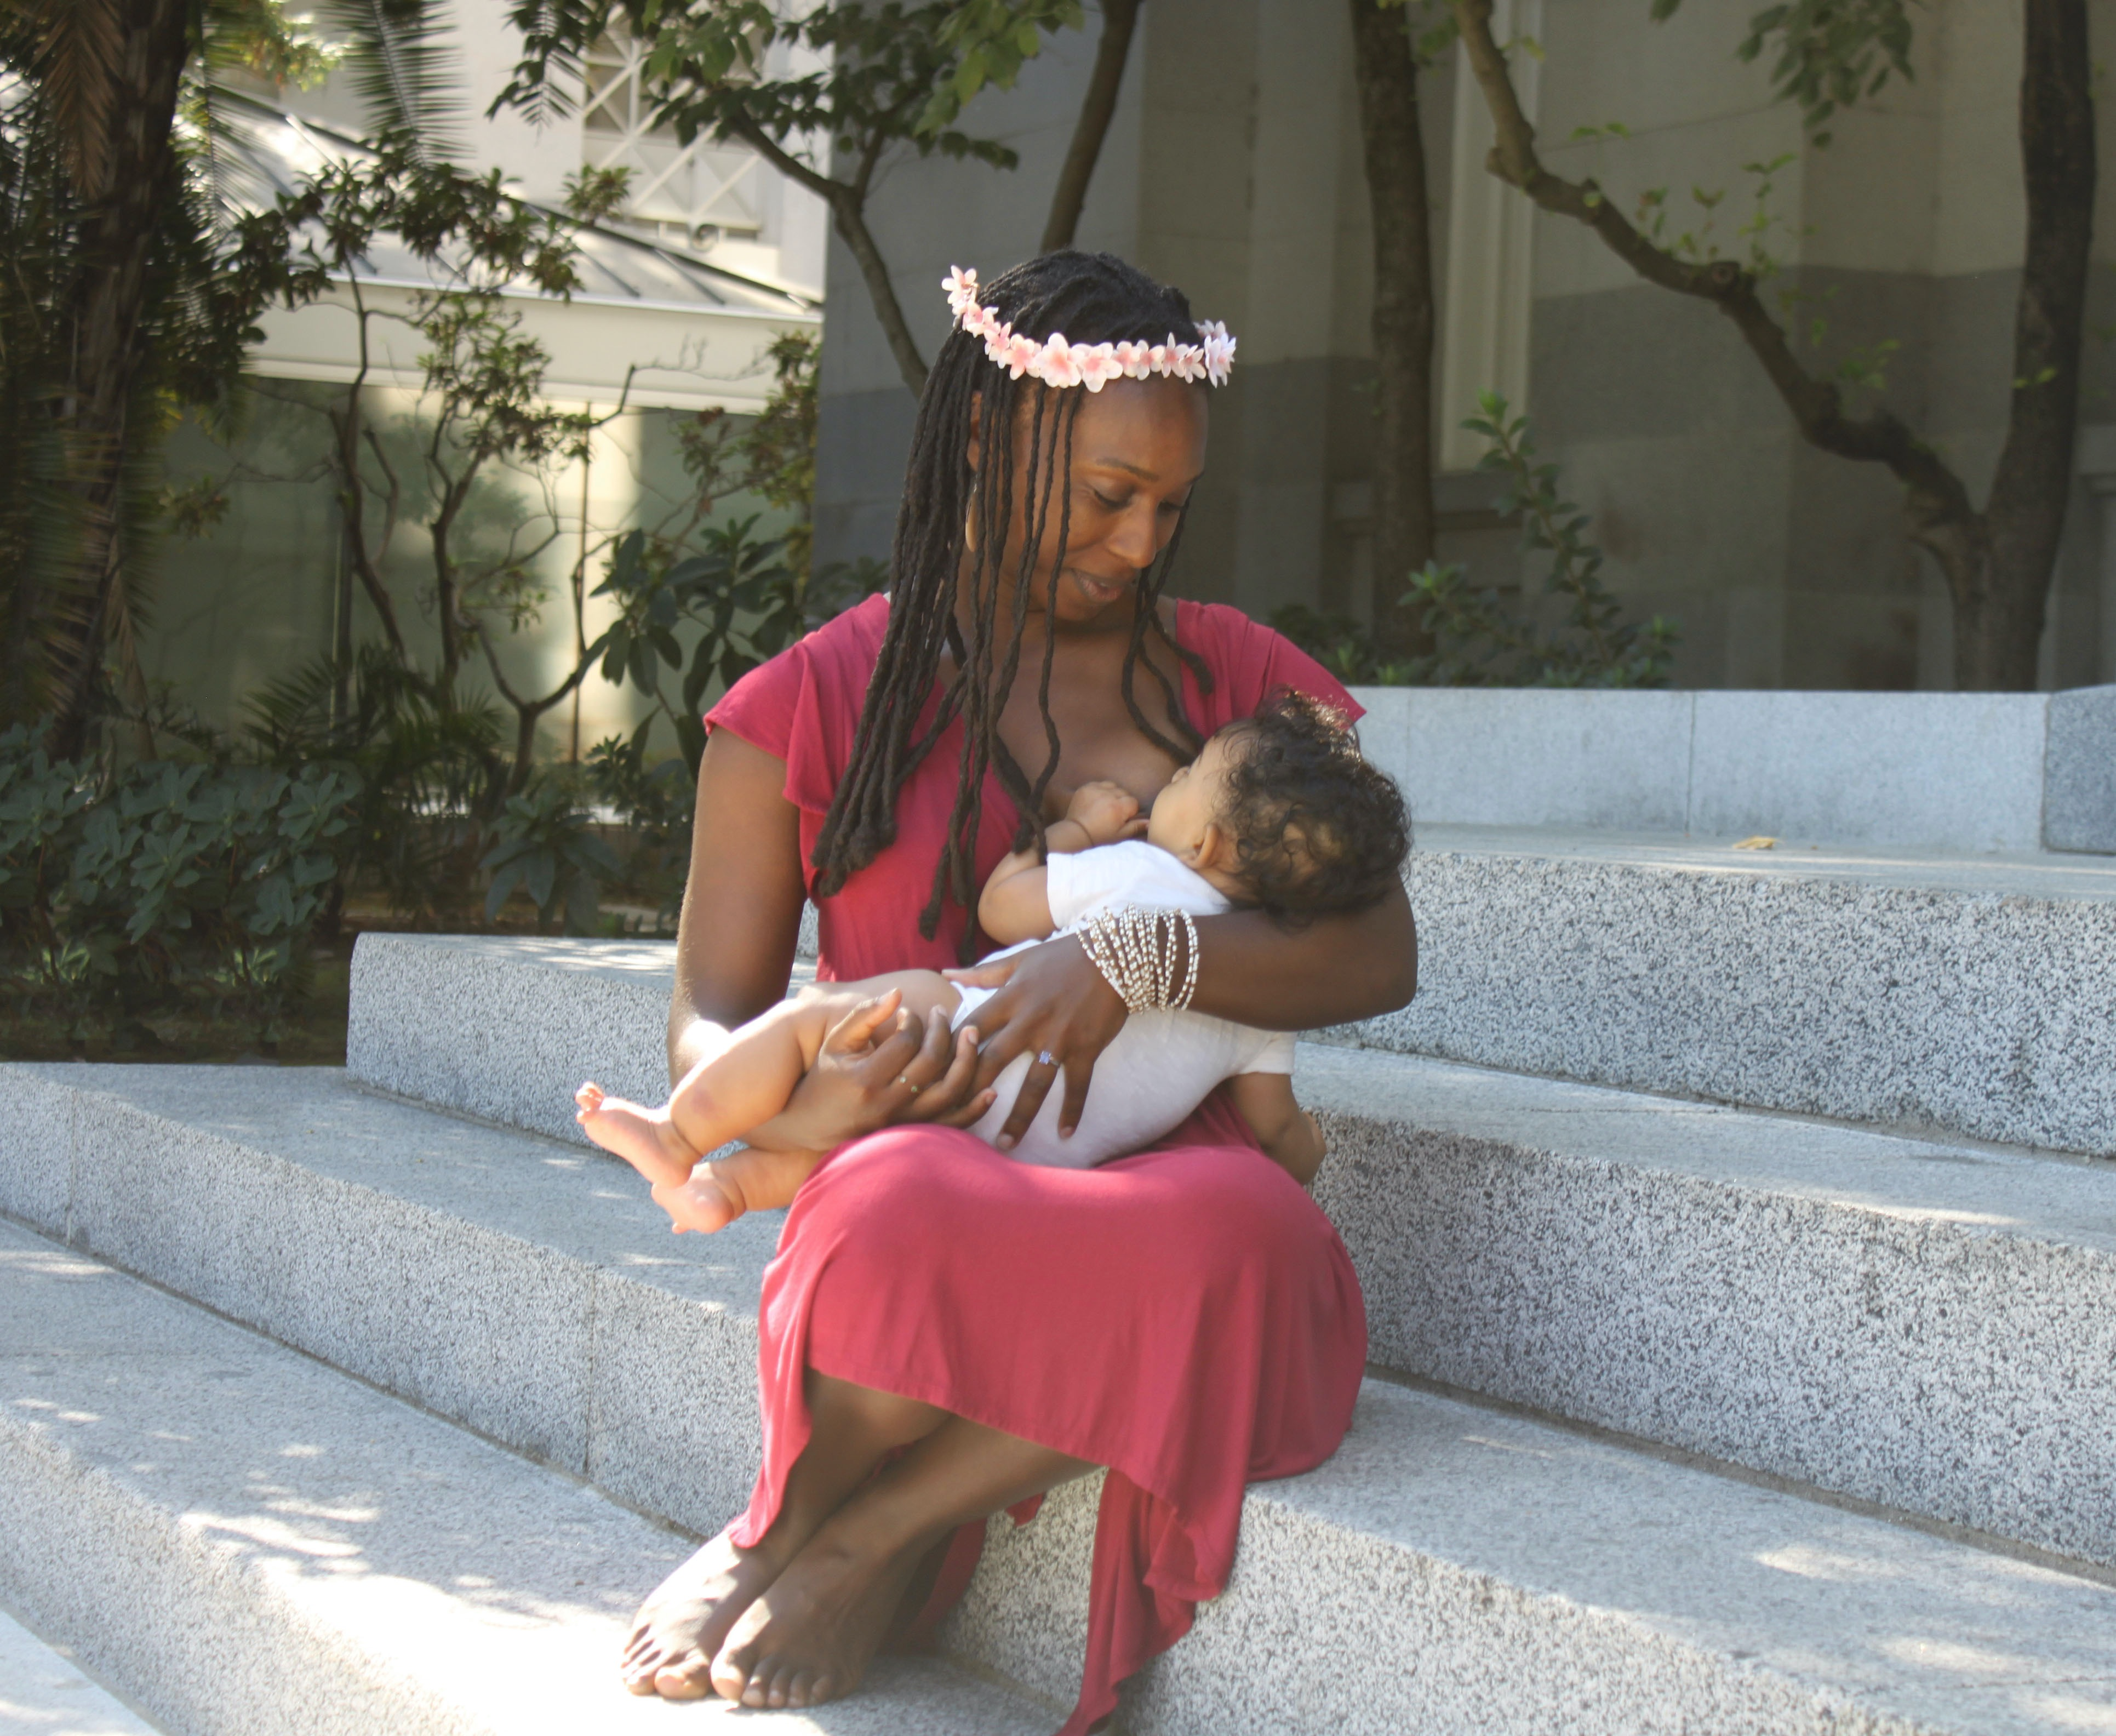 Kavisa Nourishing Justly - Breastfeeding at California Capitol